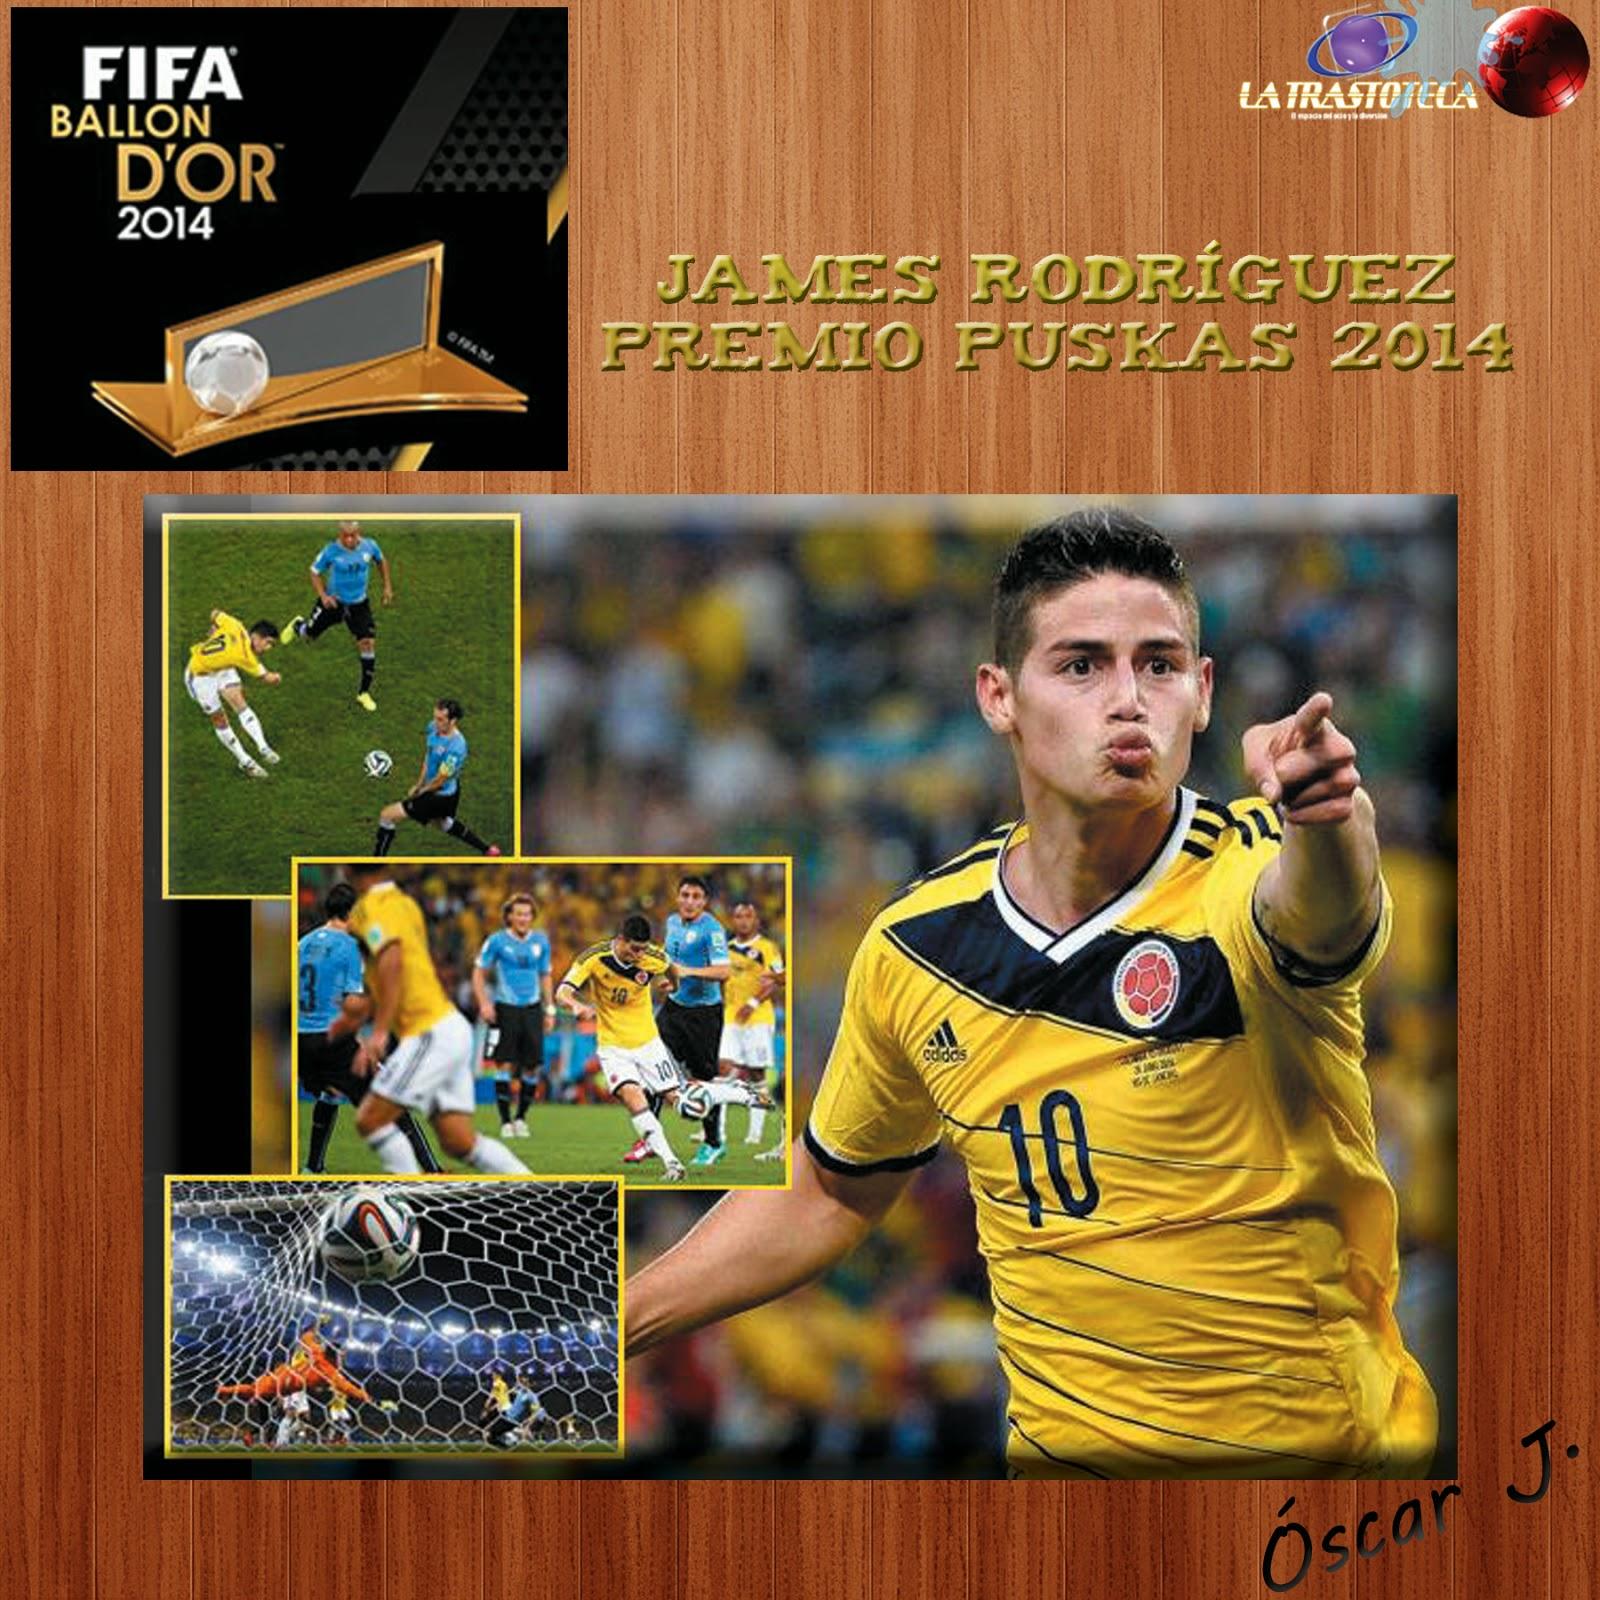 James Rodríguez, Premio Puskas 2014 al mejor gol